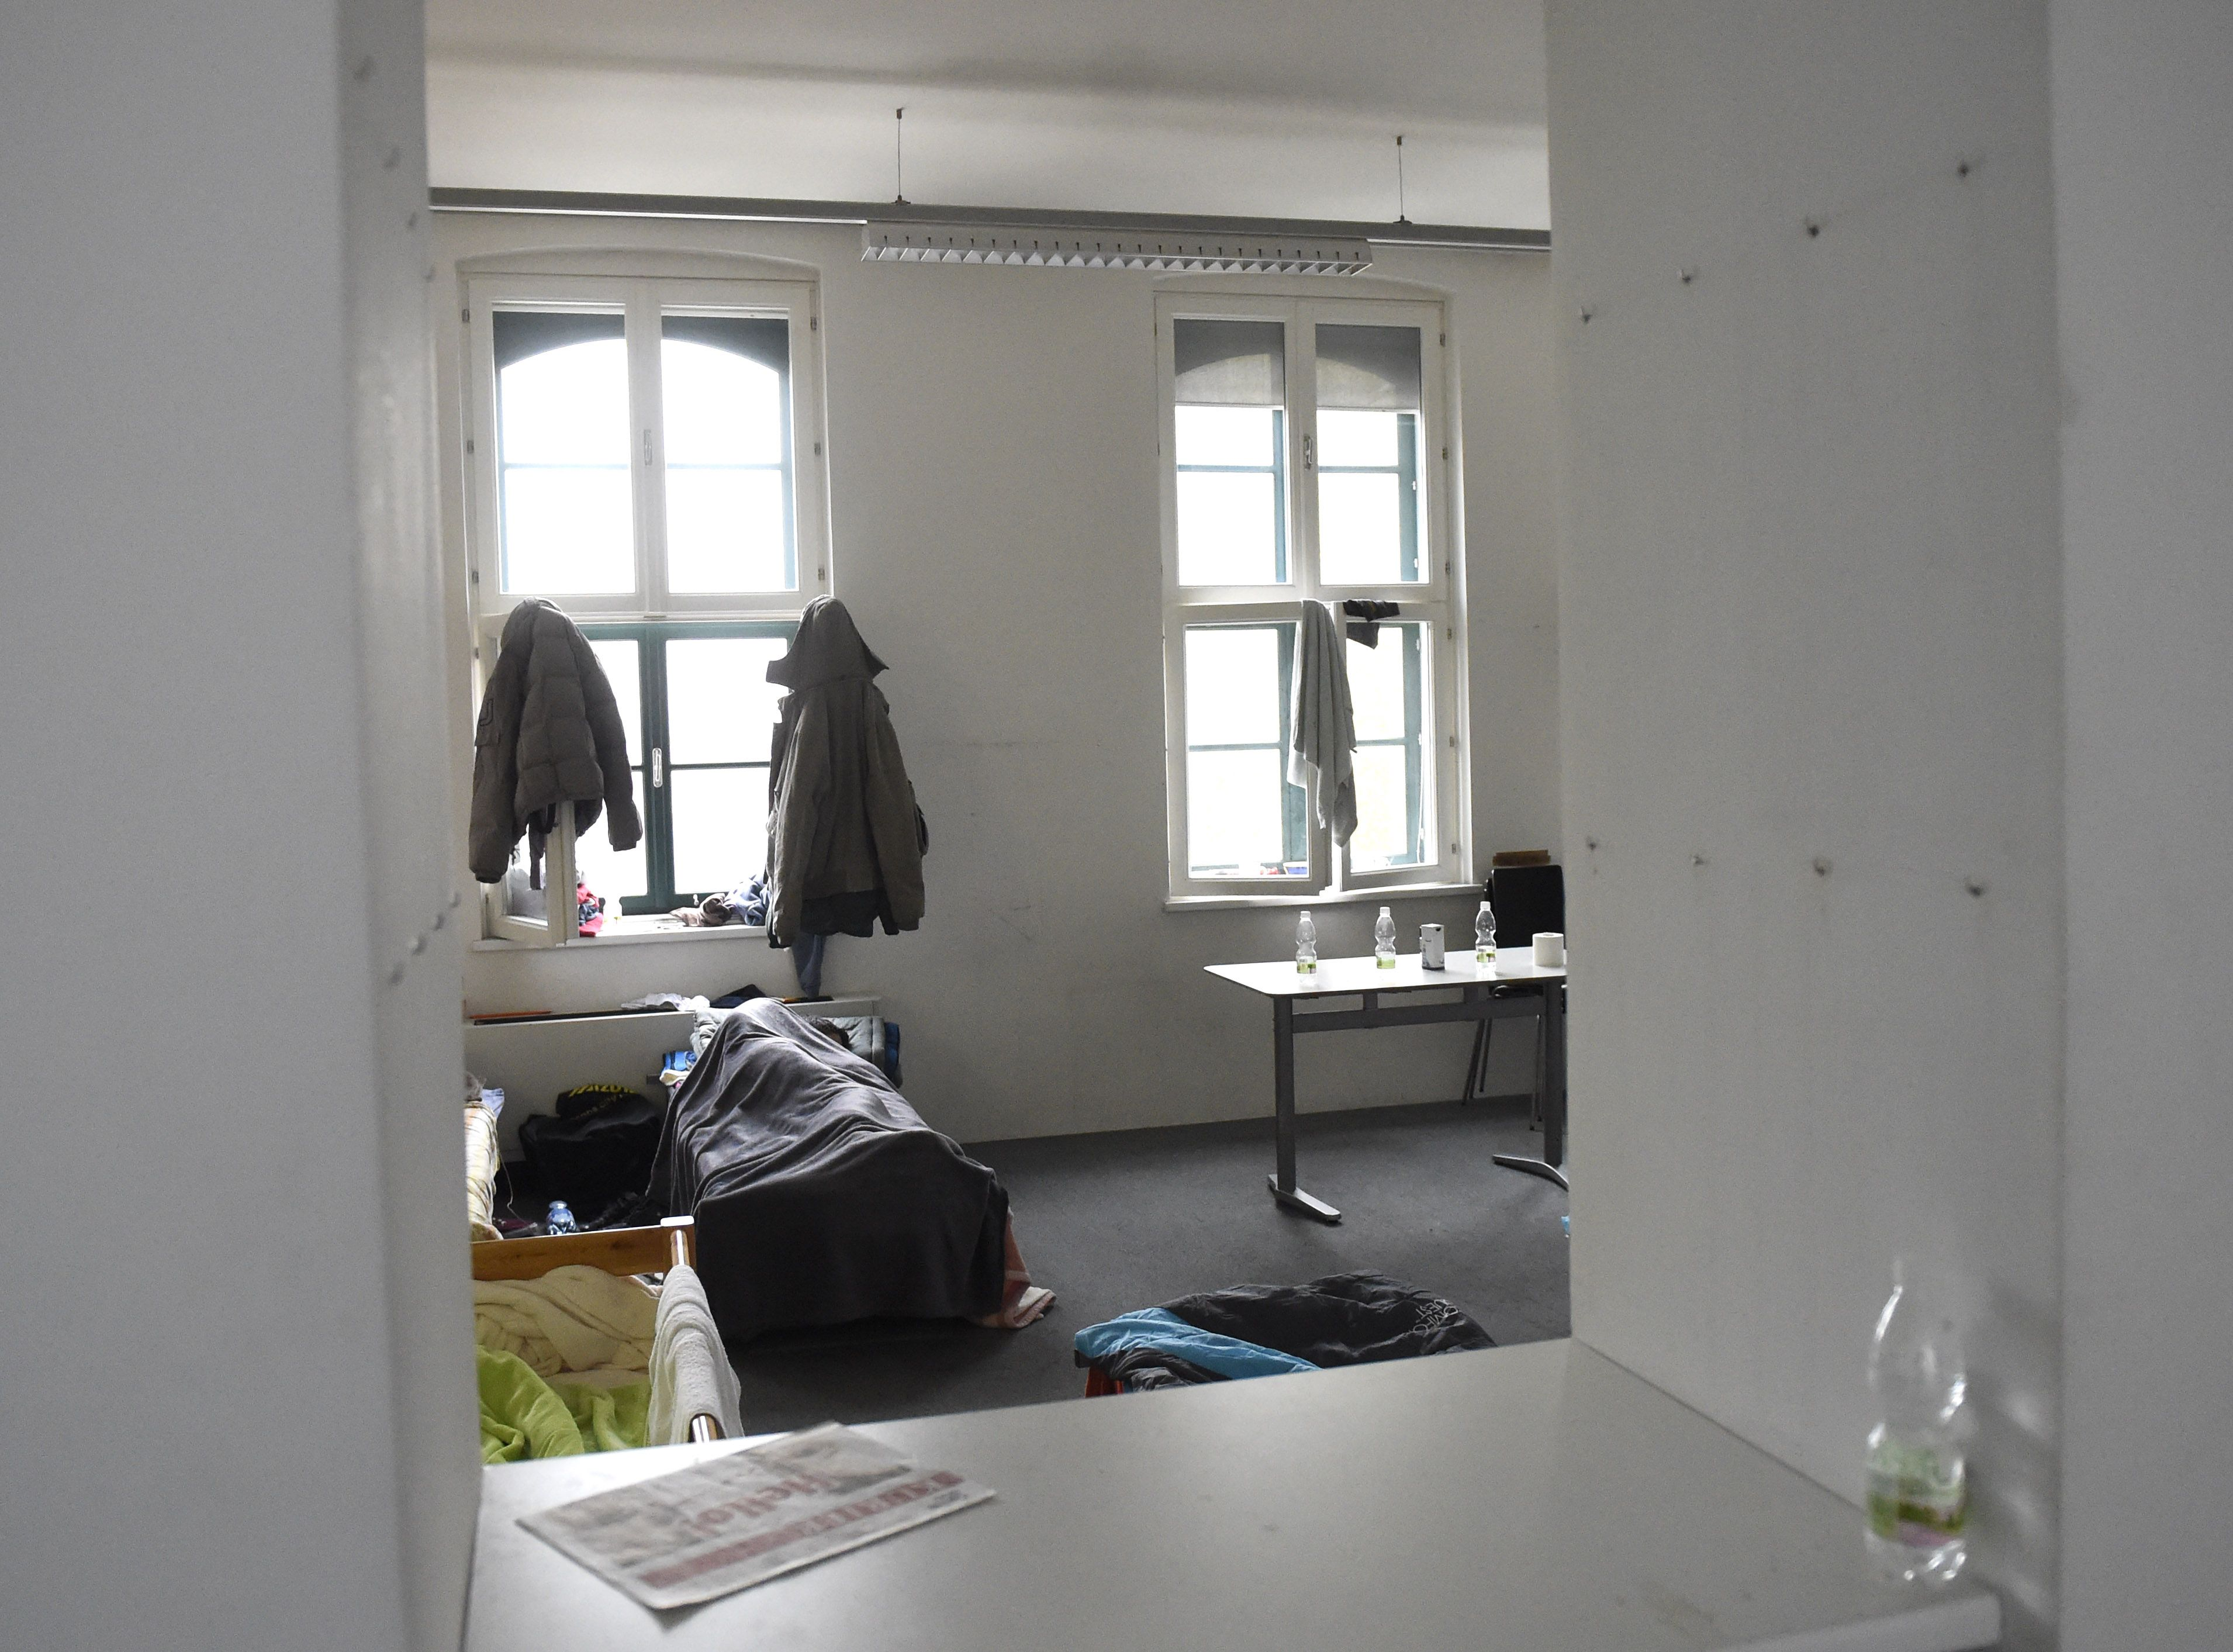 Wiens größtes Flüchtlingsheim in Wien-Hietzing schließt